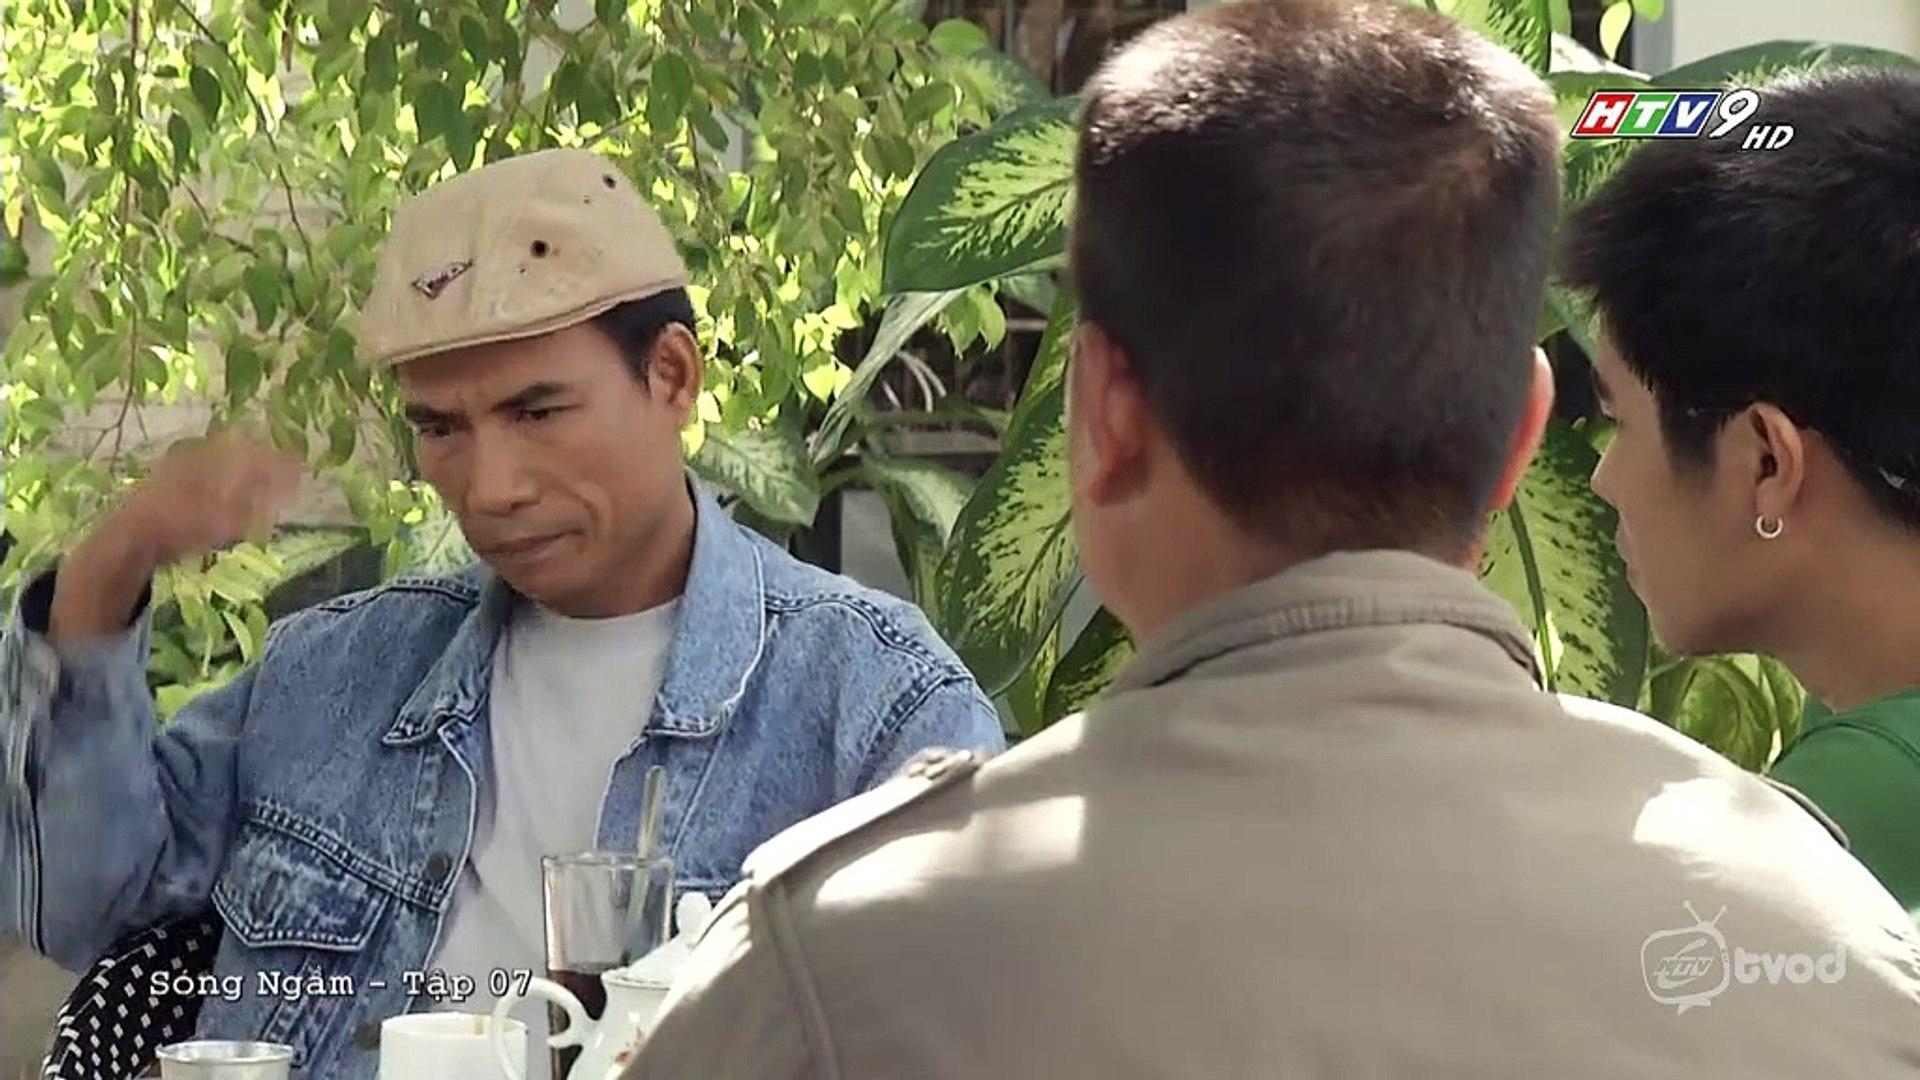 Phim HTV9 - Sóng Ngầm Tập 7 - Phim Việt Nam